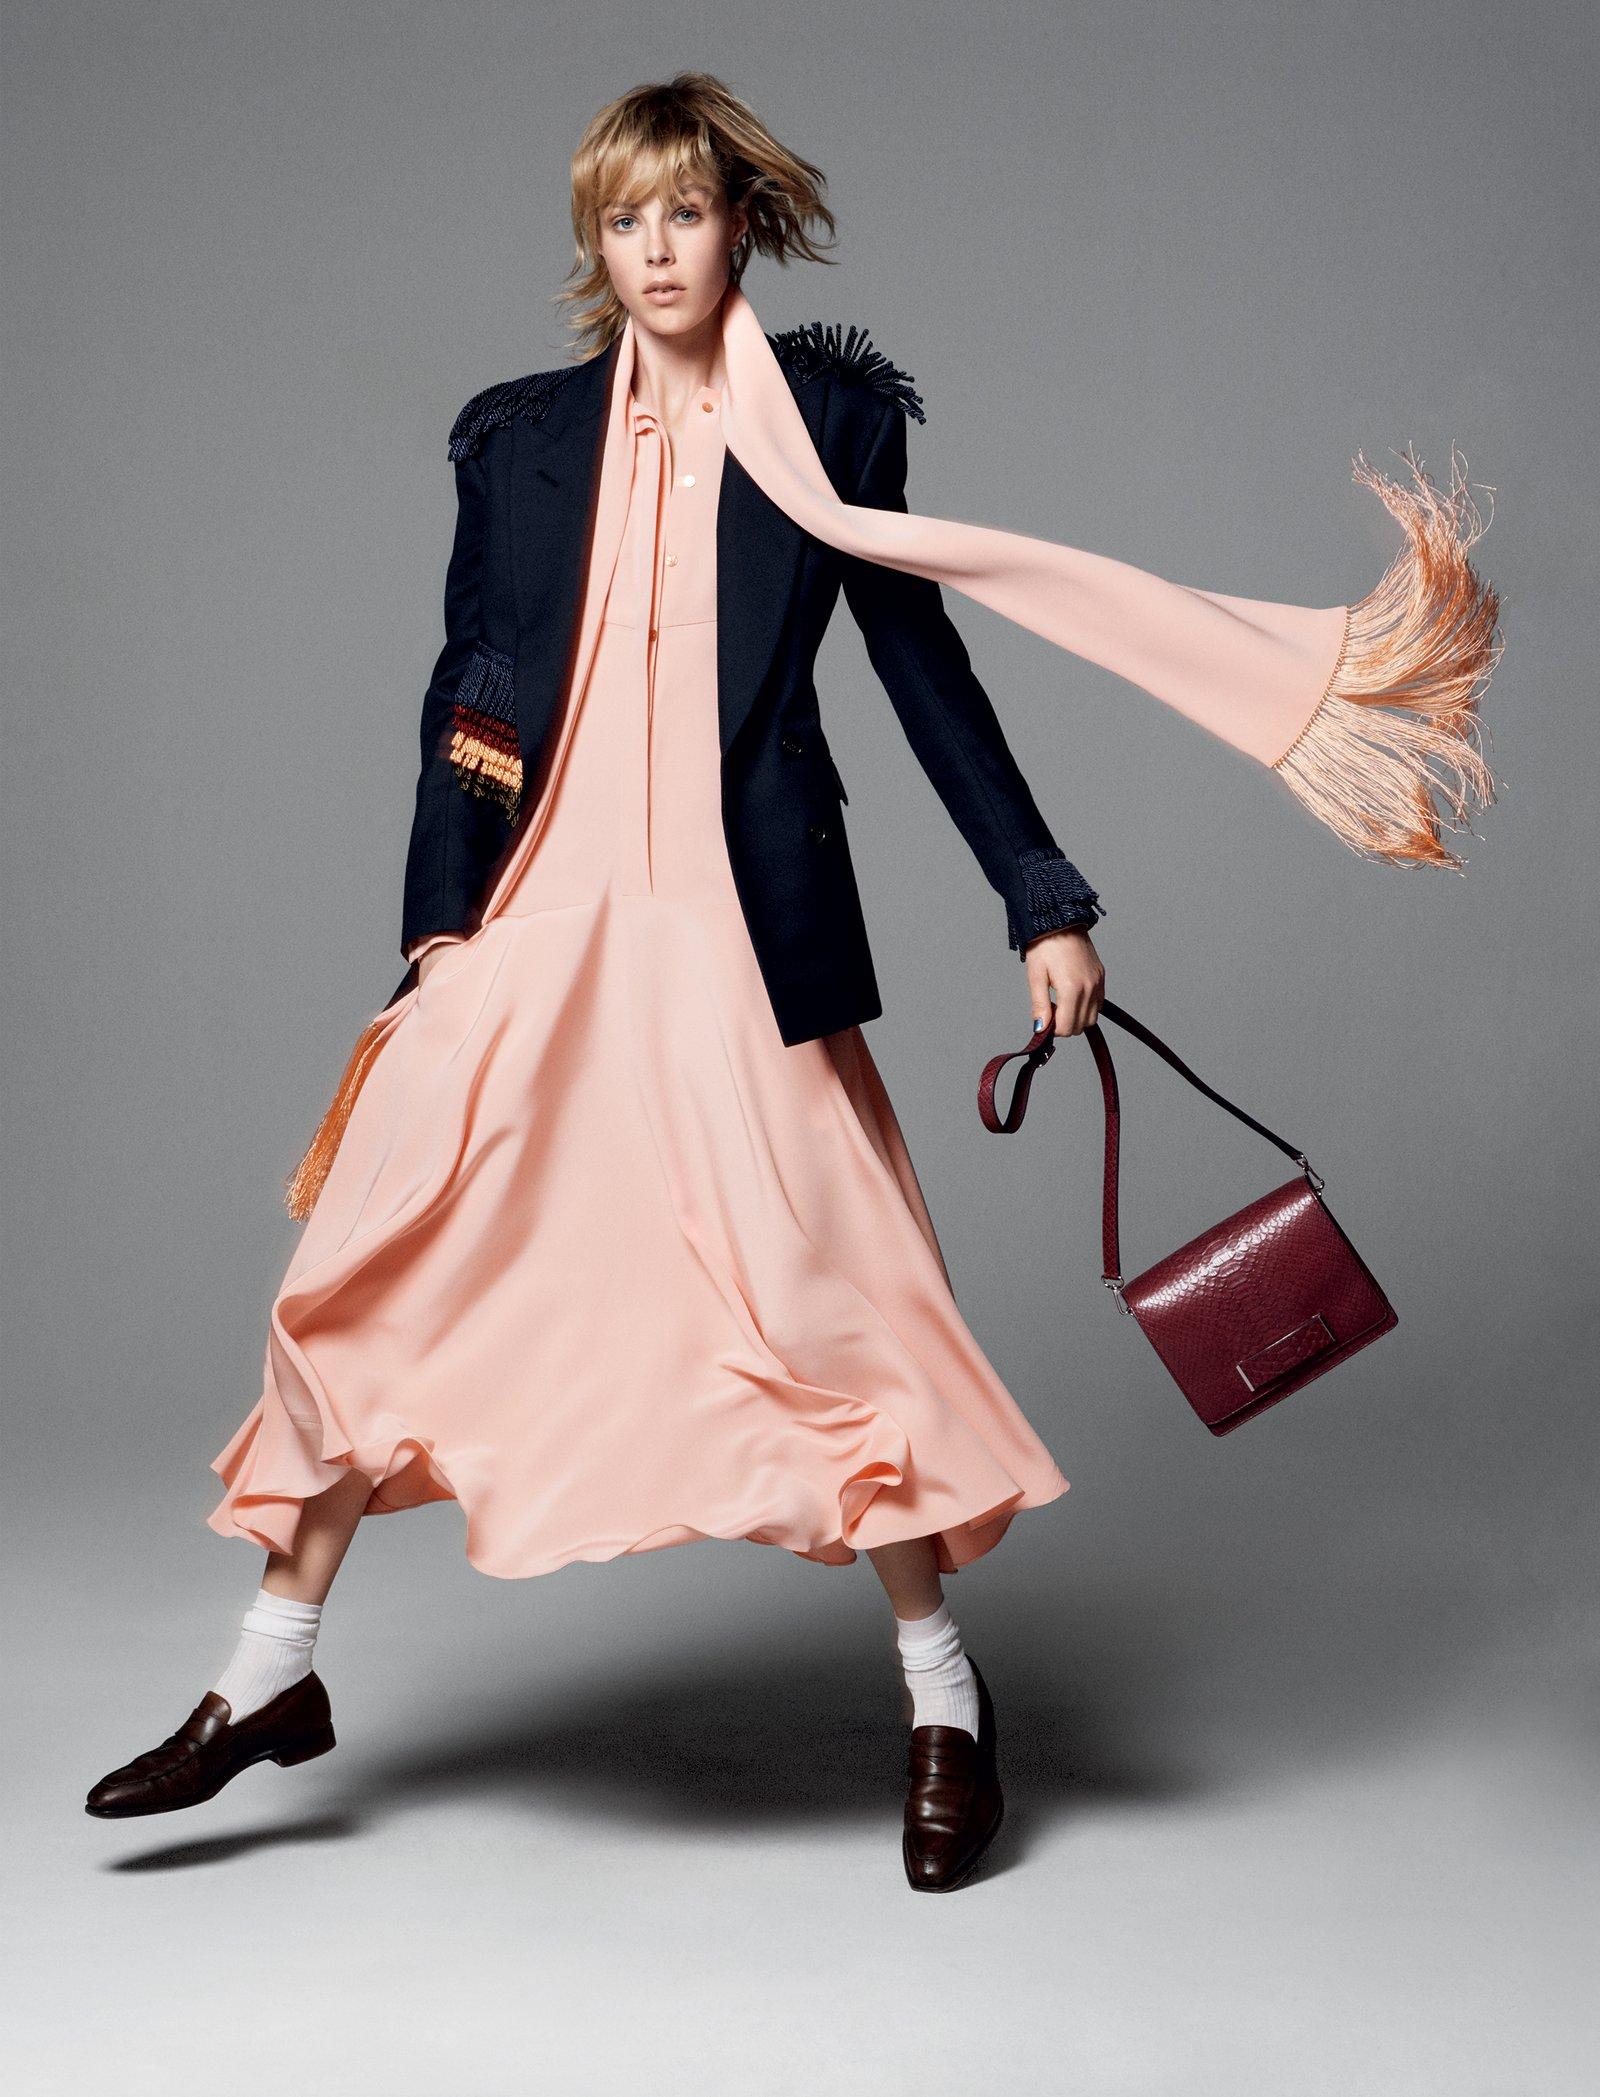 hillier-bartley-new-fashion-label-01